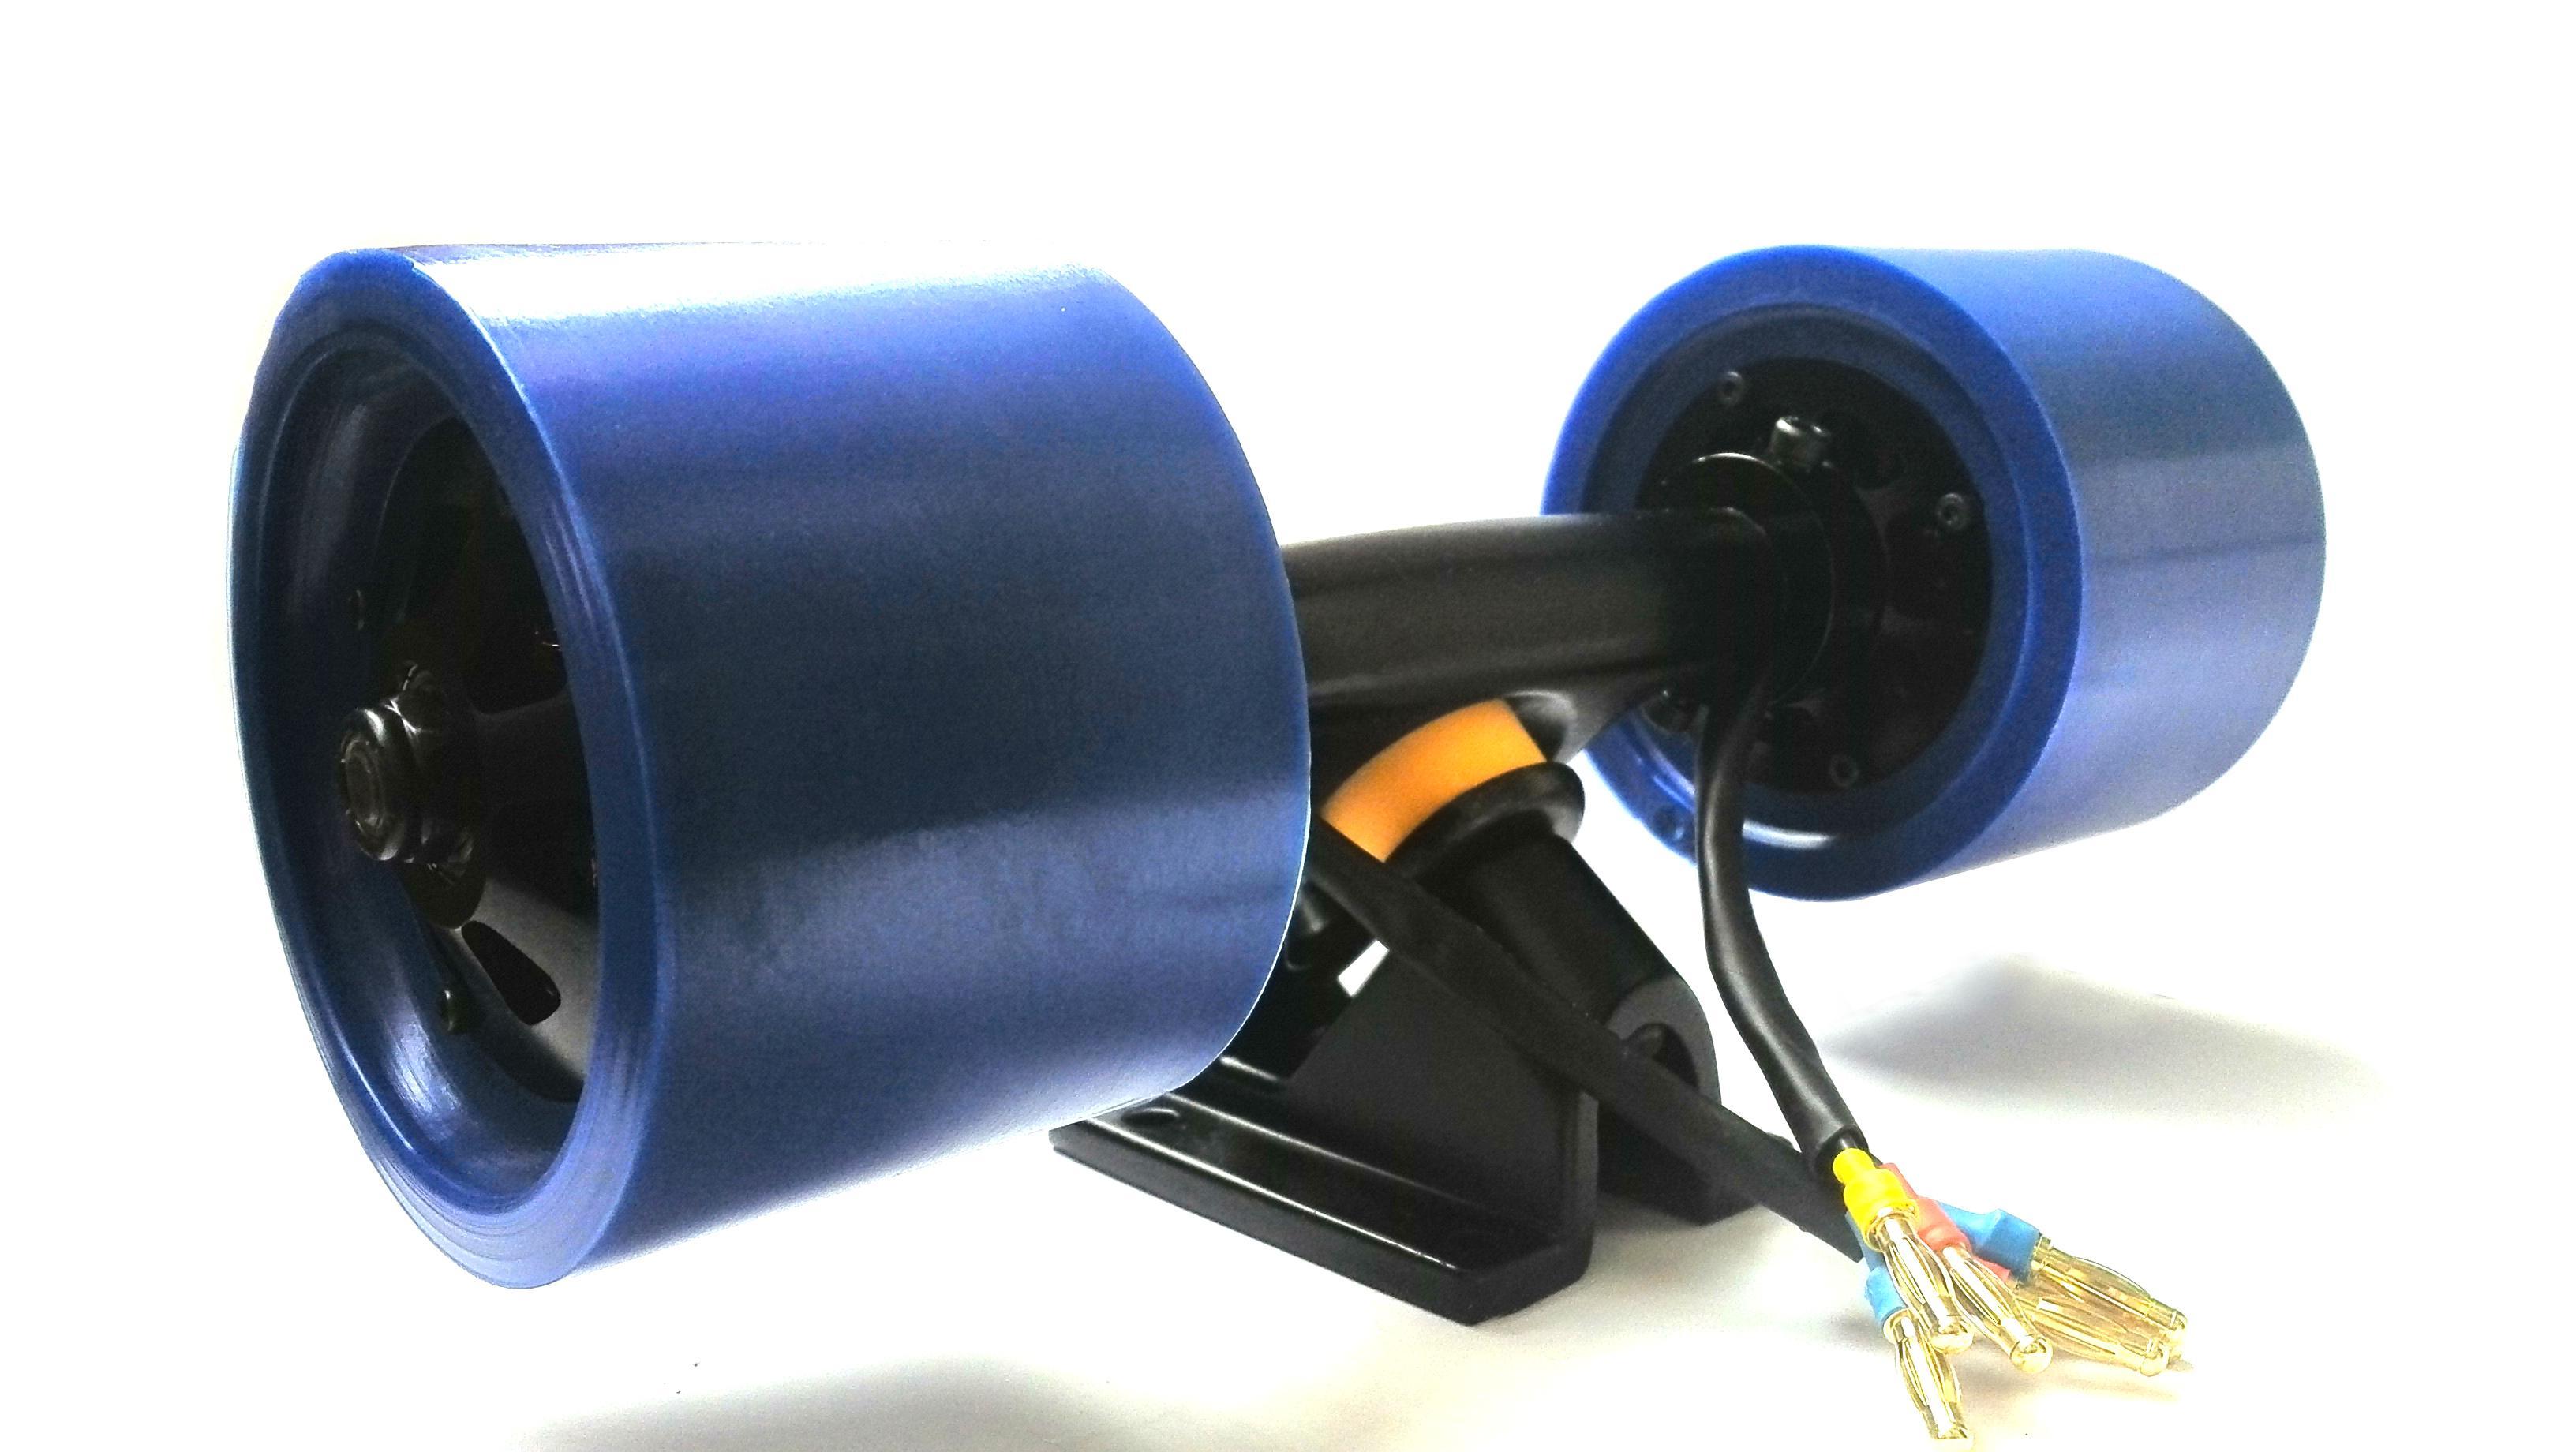 Dual Hub Motor Kit For Electric Skateboard Longboard For